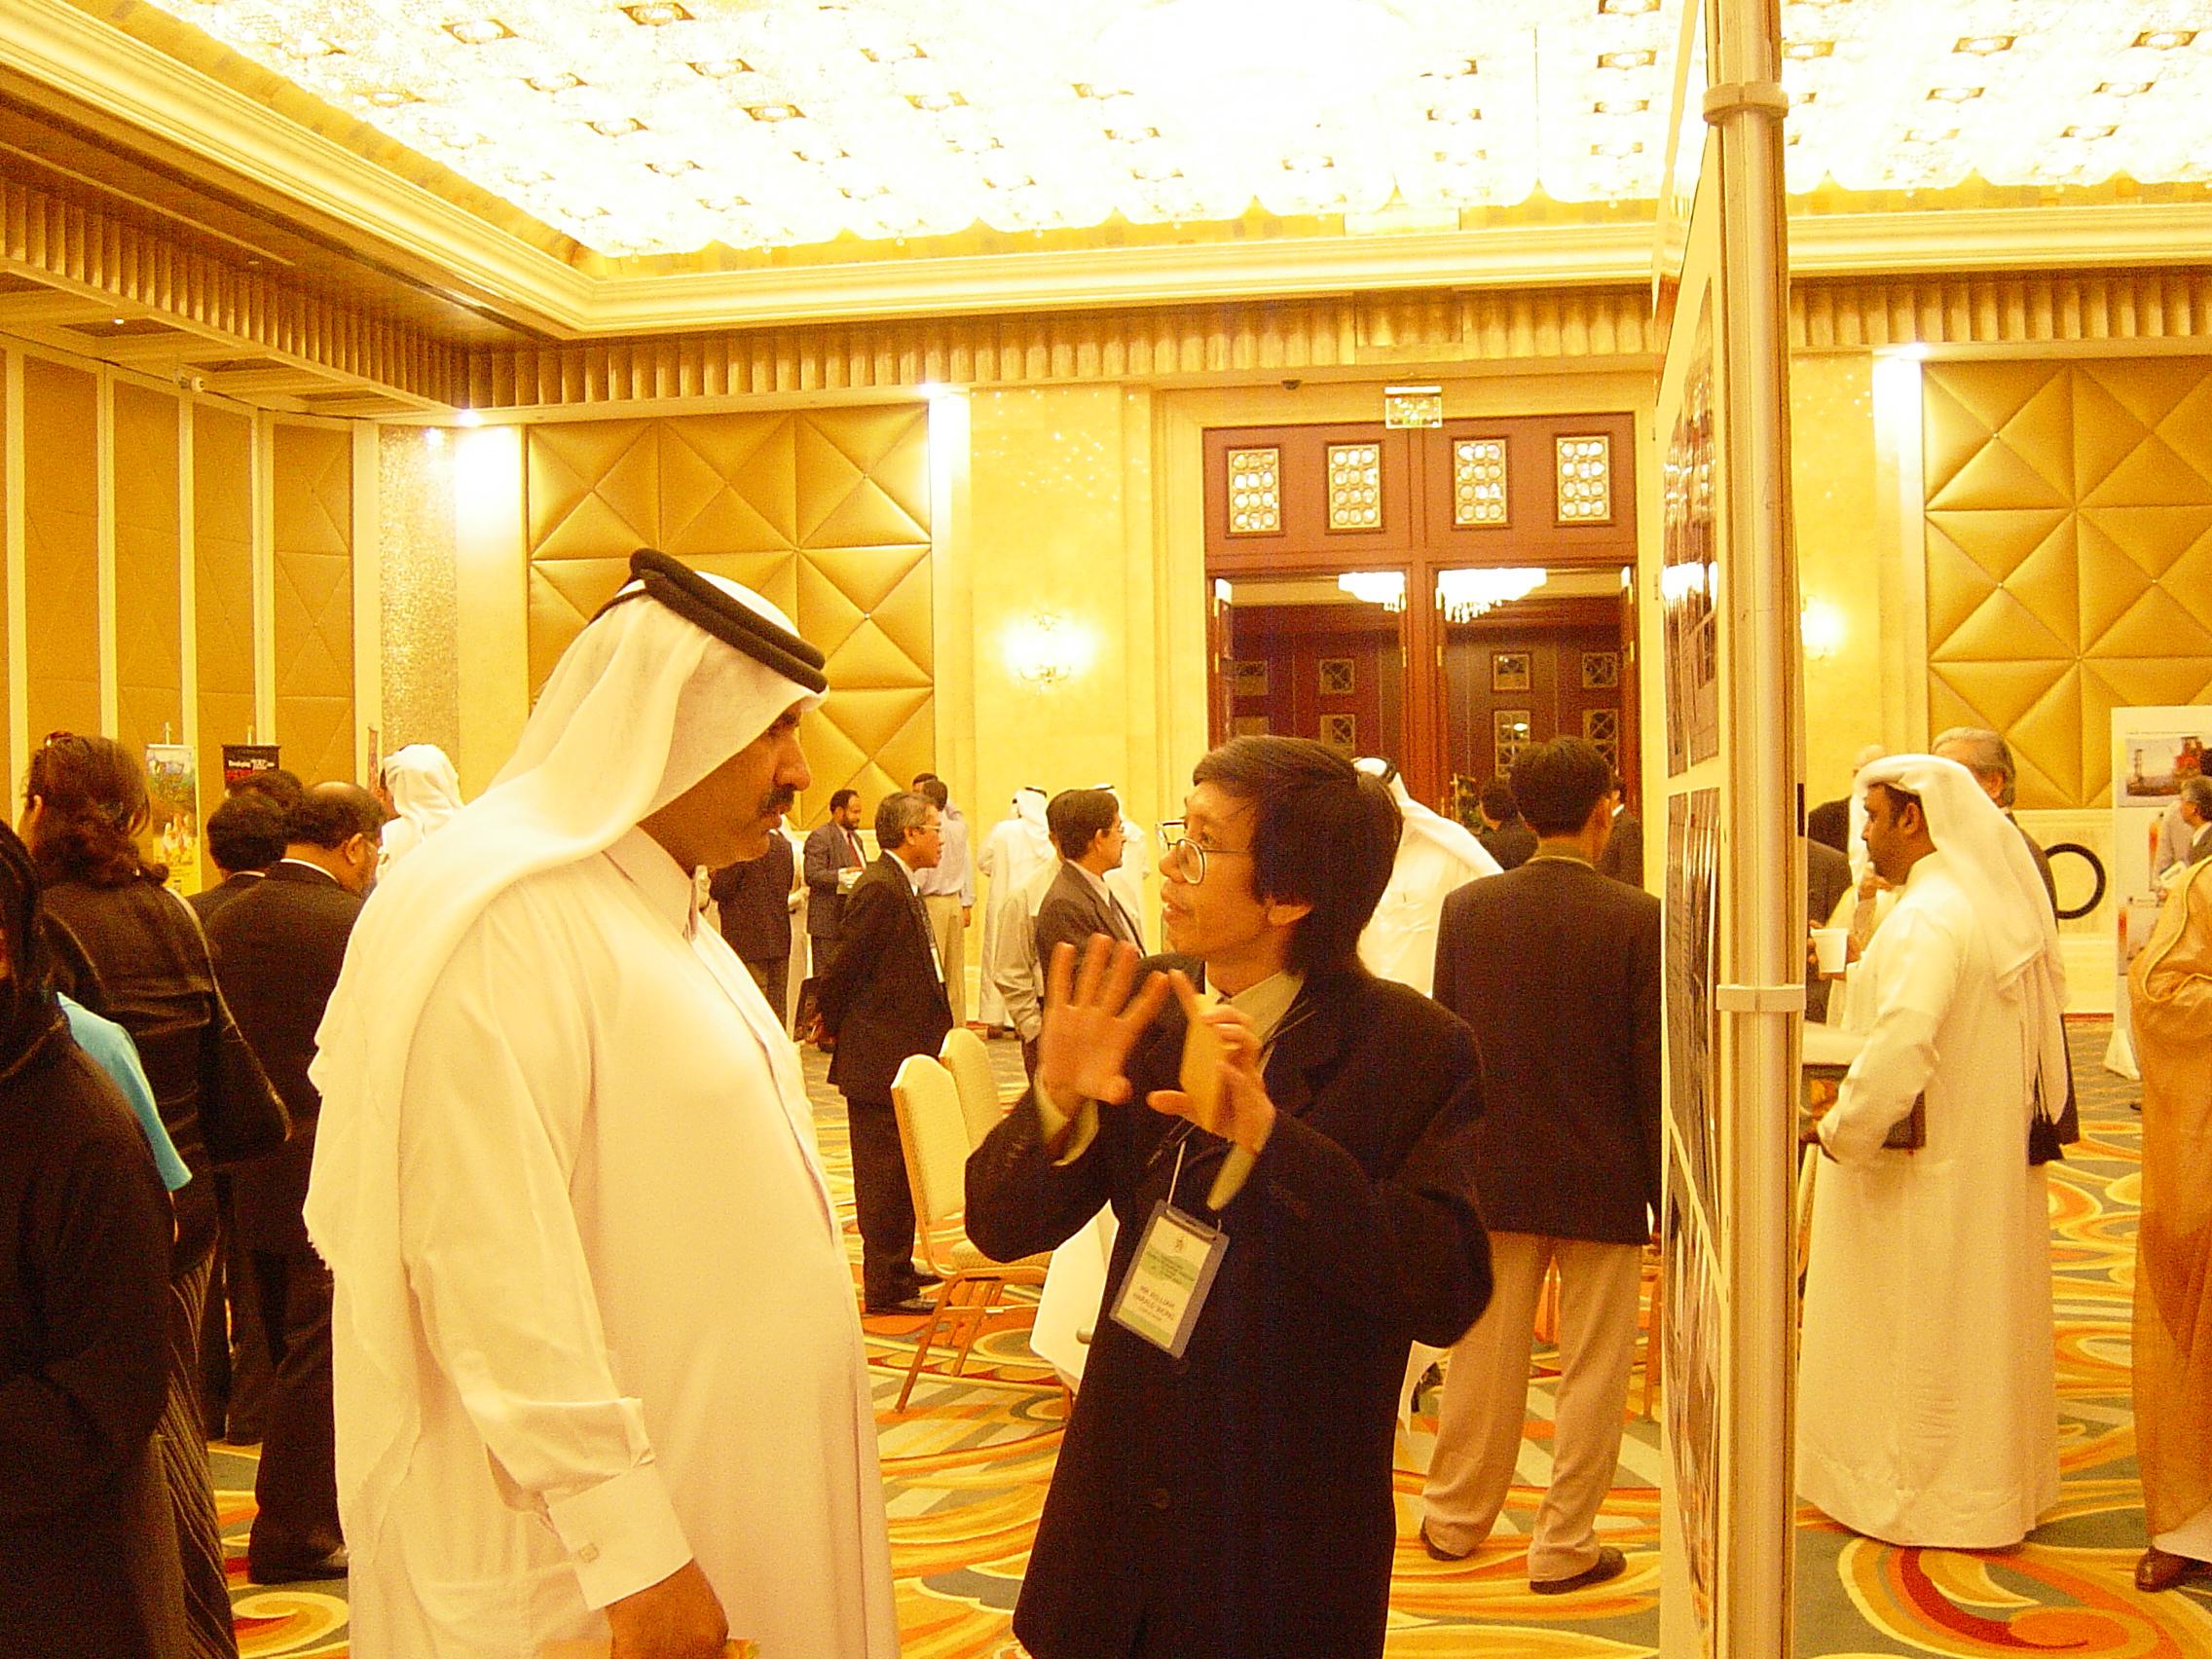 PIX_QA_Doha_William at Trade Exhibition.jpg